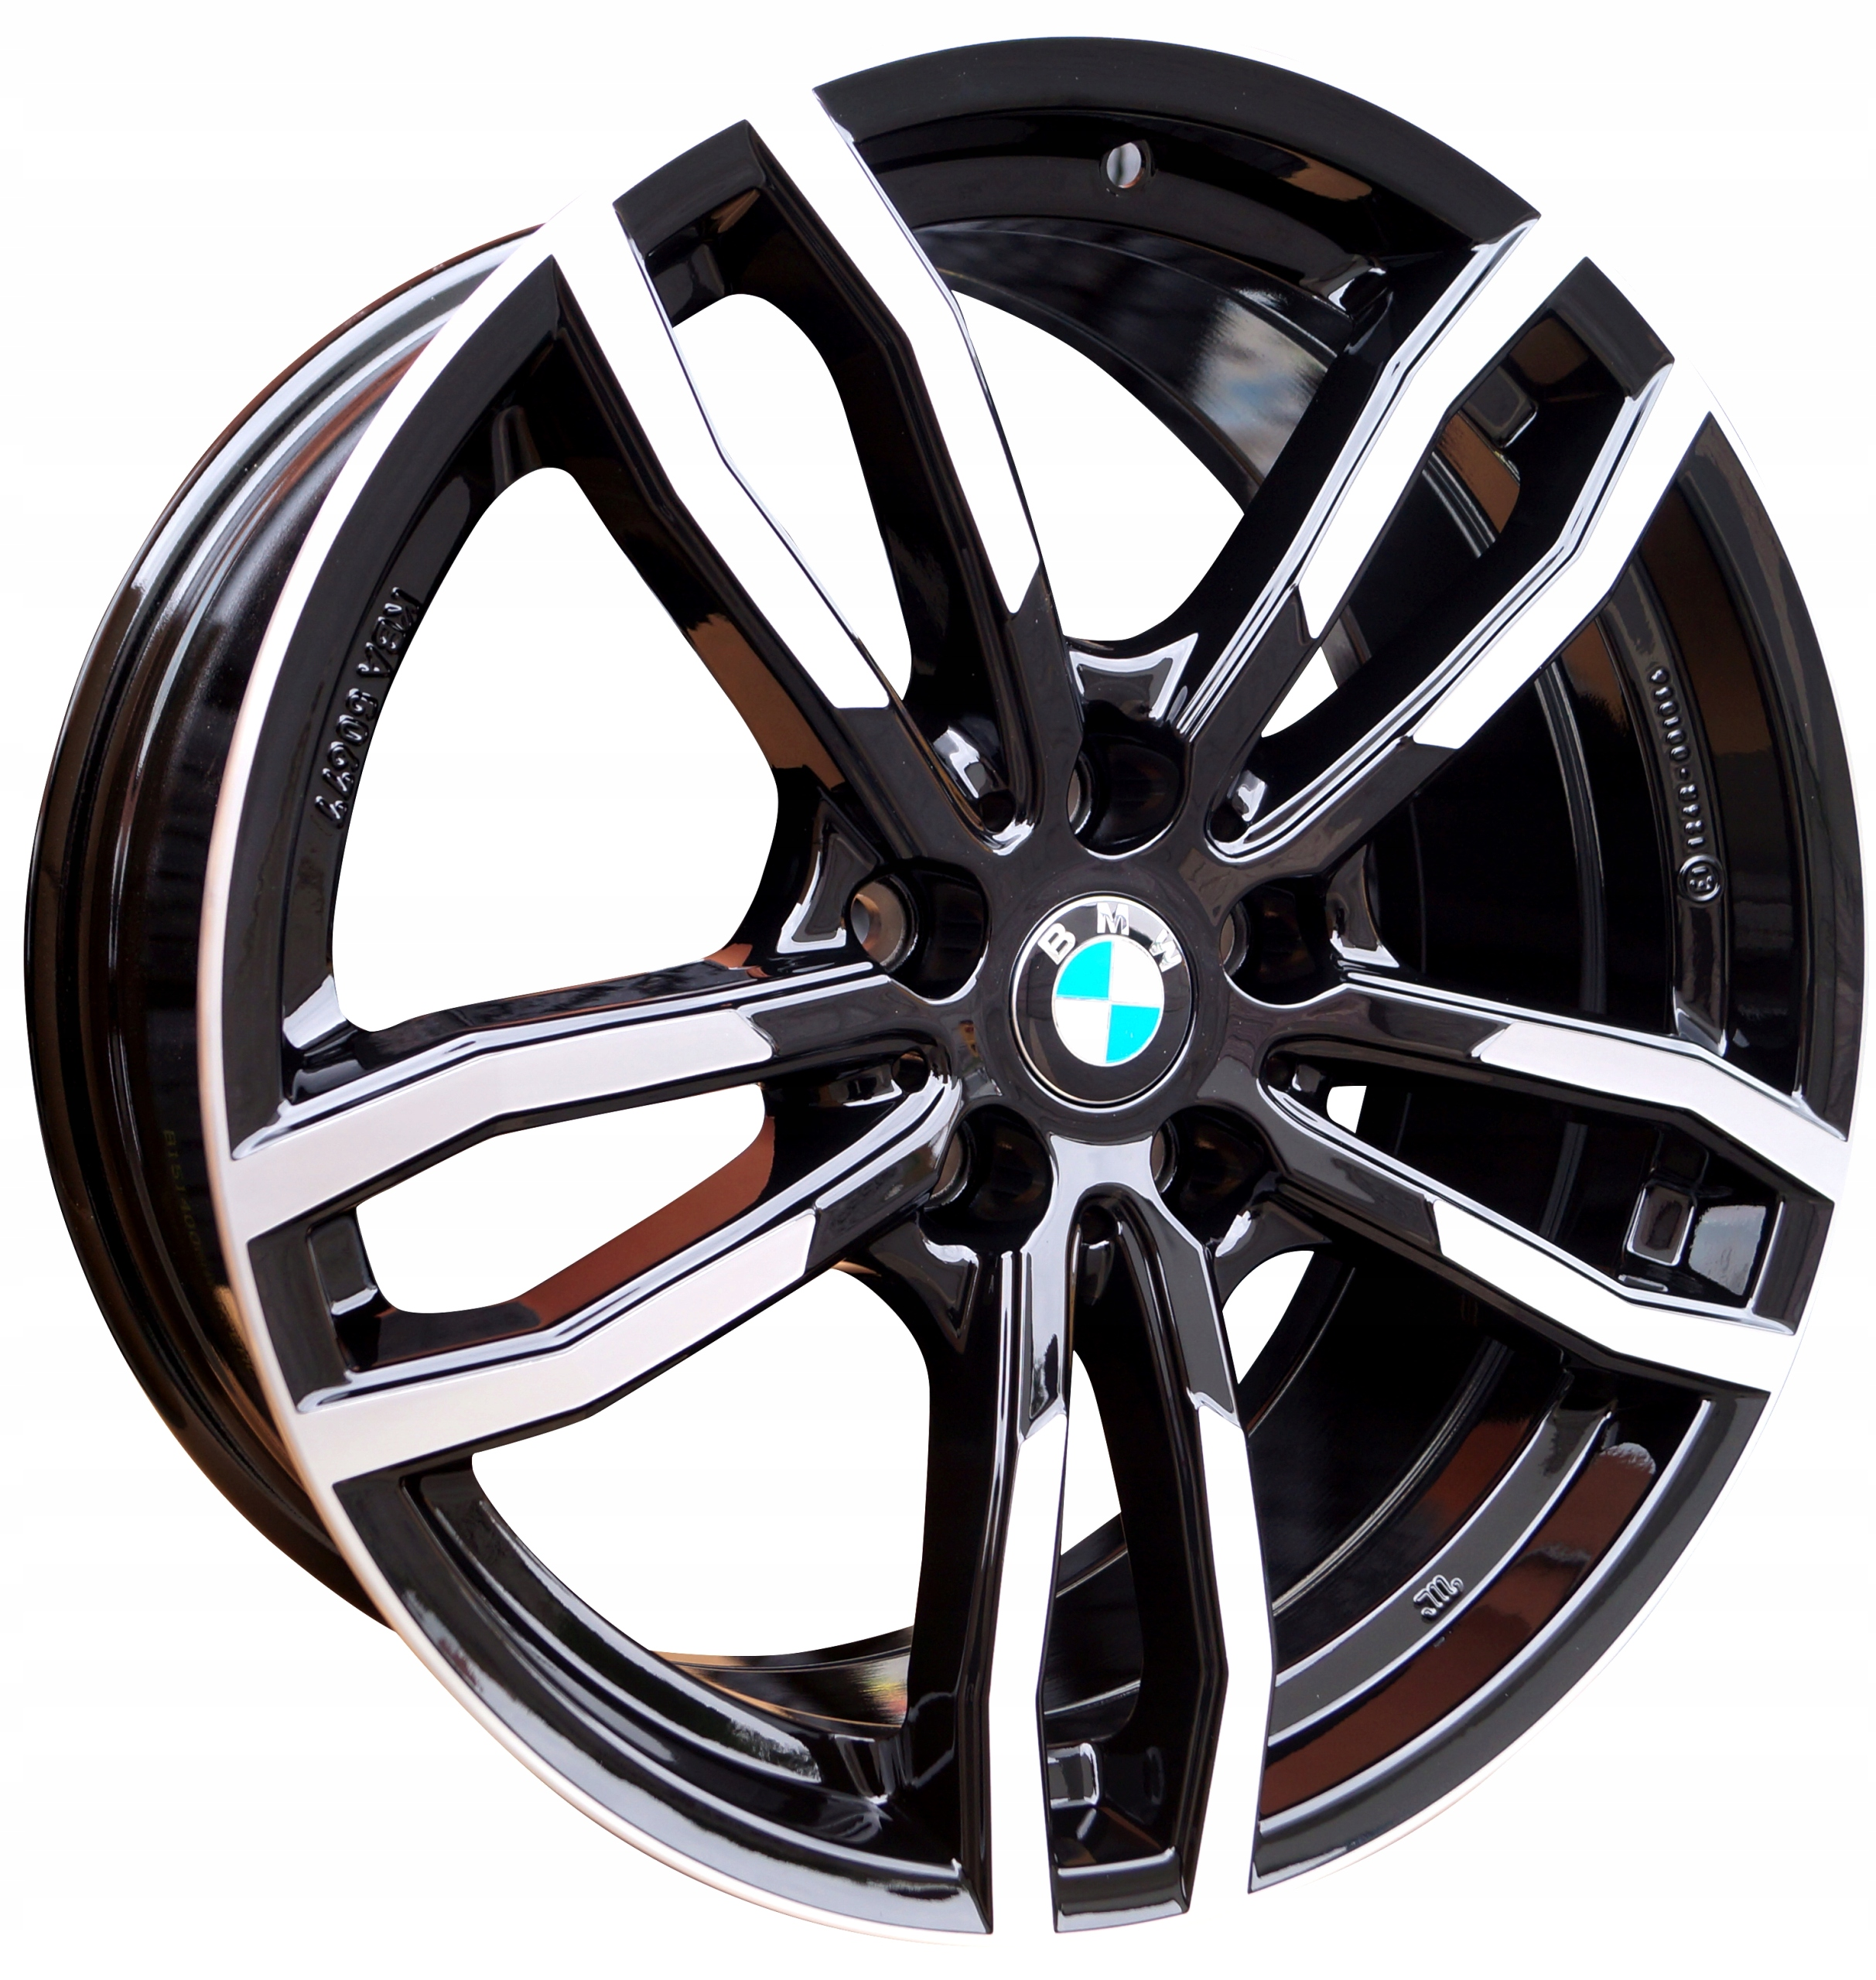 FELGI 18'' 5x120 BMW 3 4 5 X3 F10 F25 F30 GERMANY